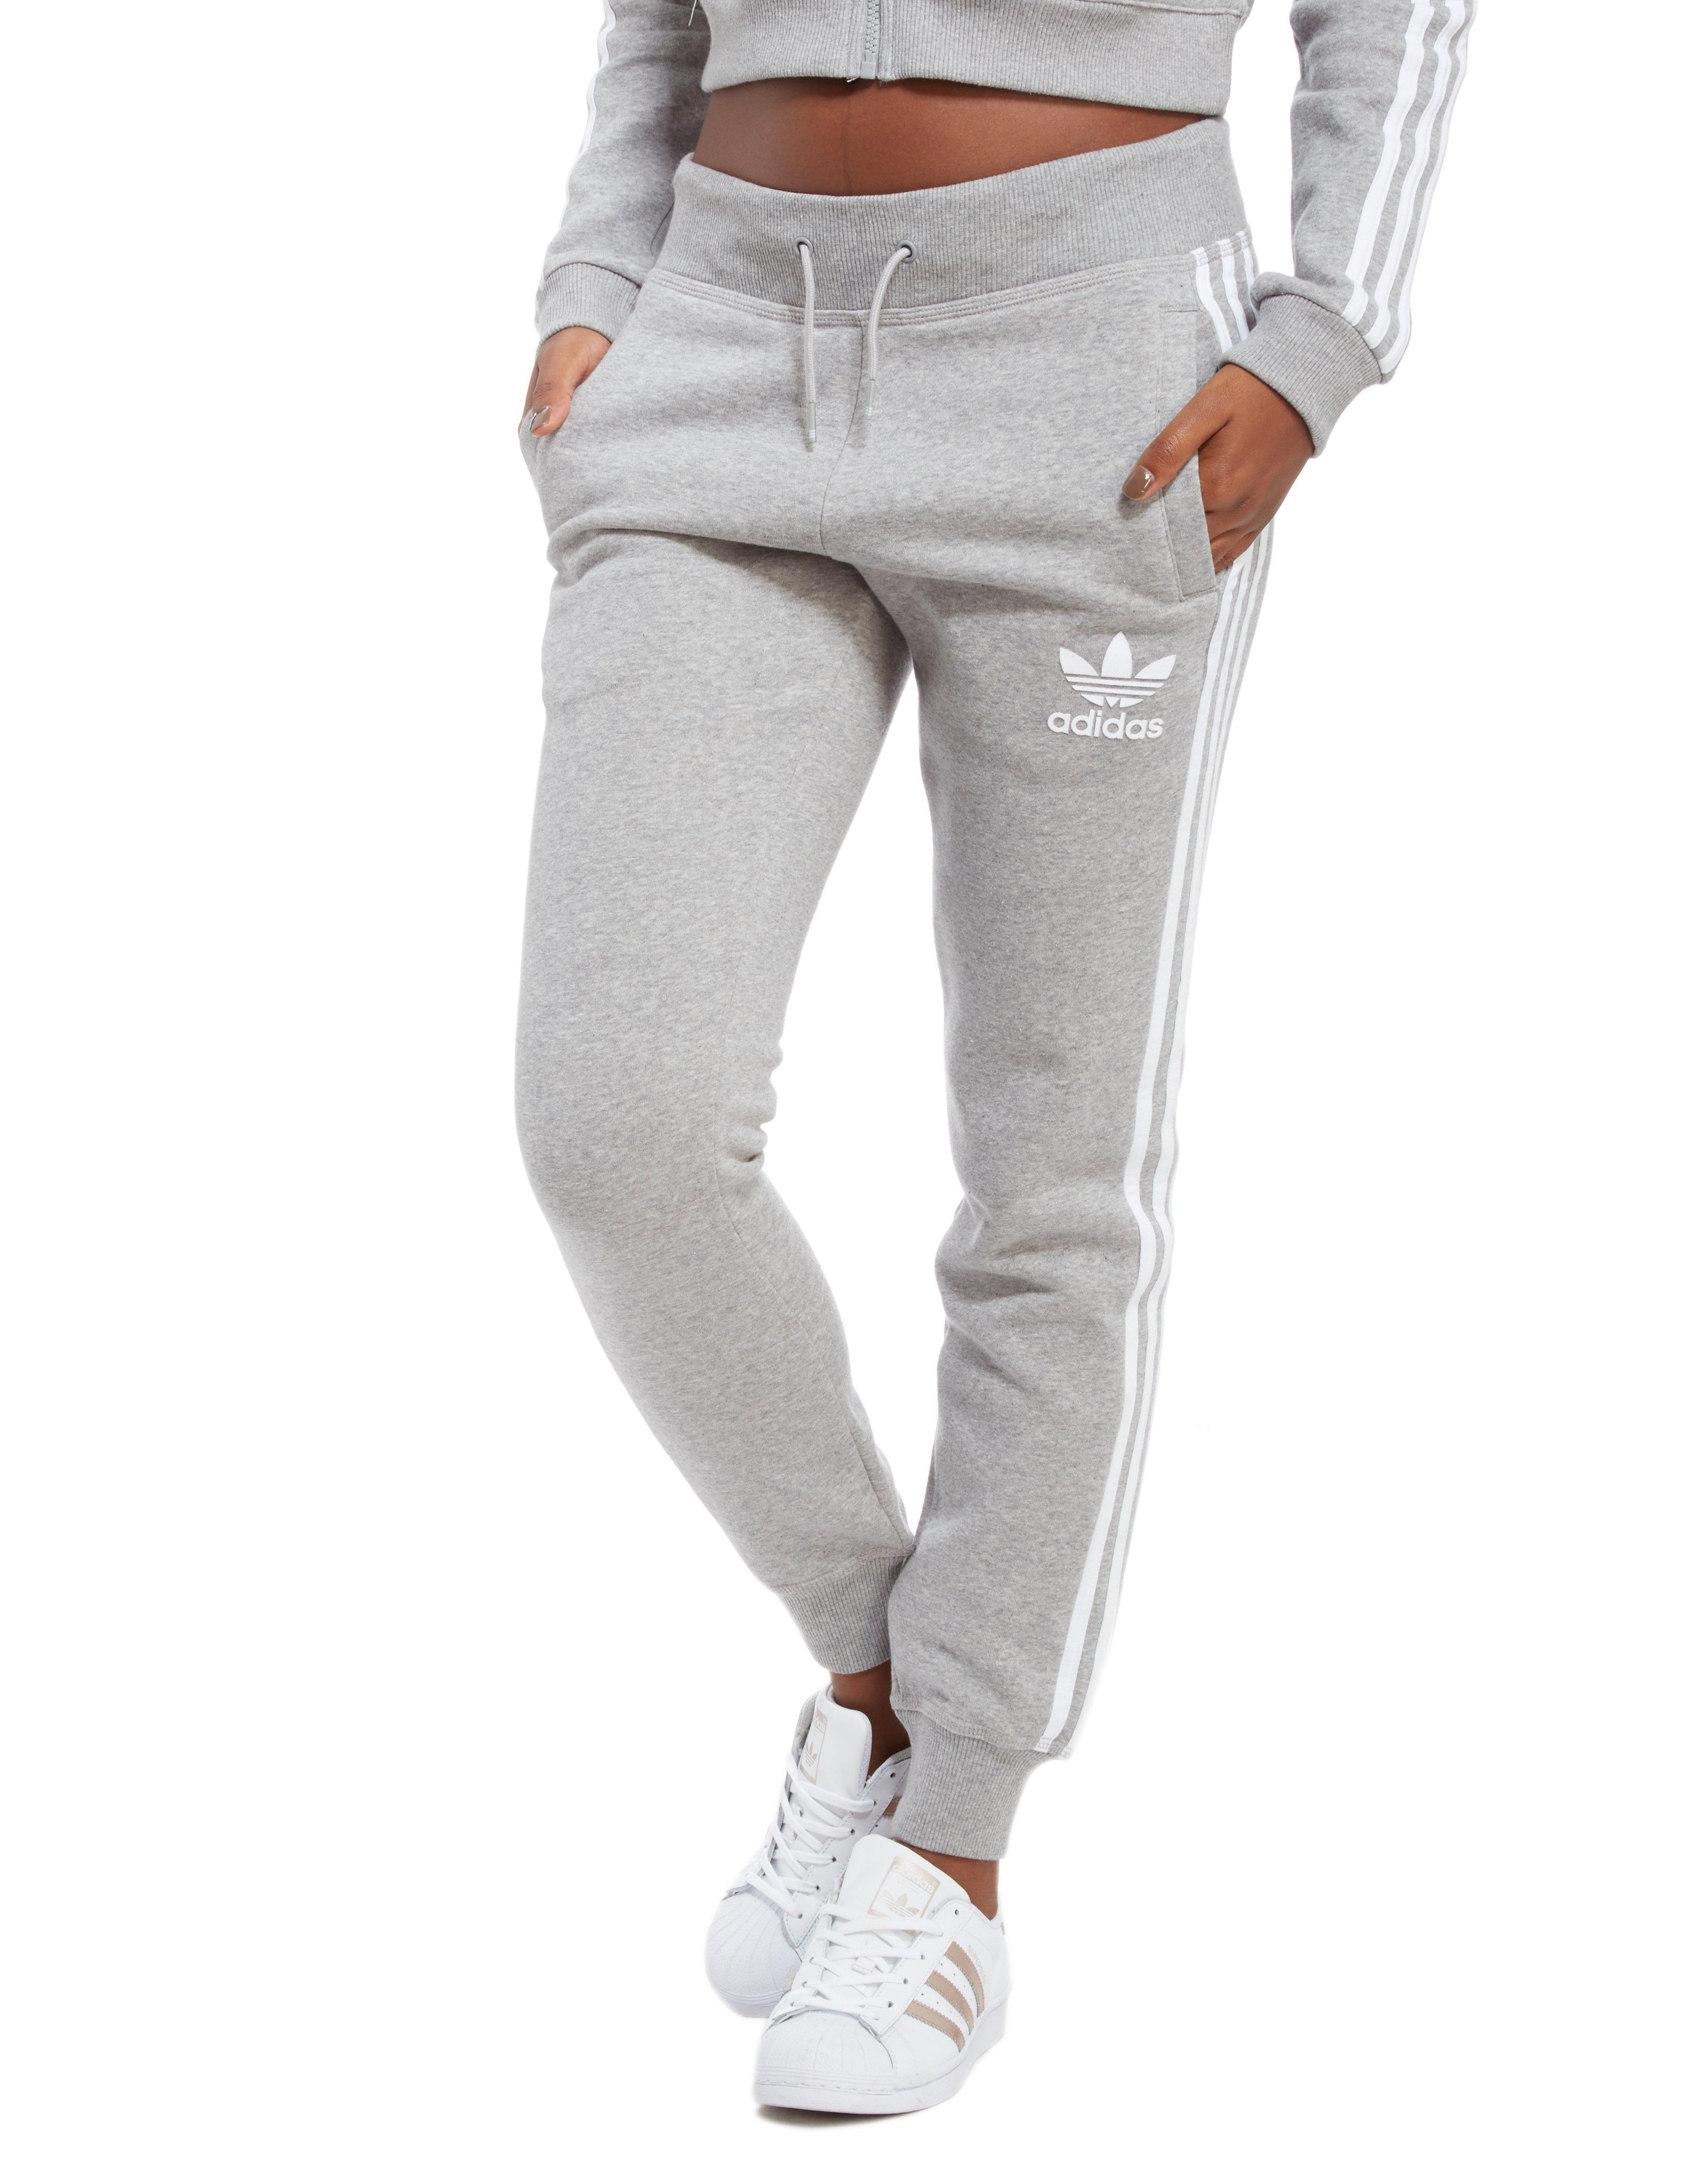 lyst adidas originali california pantaloni della tuta in grigio.